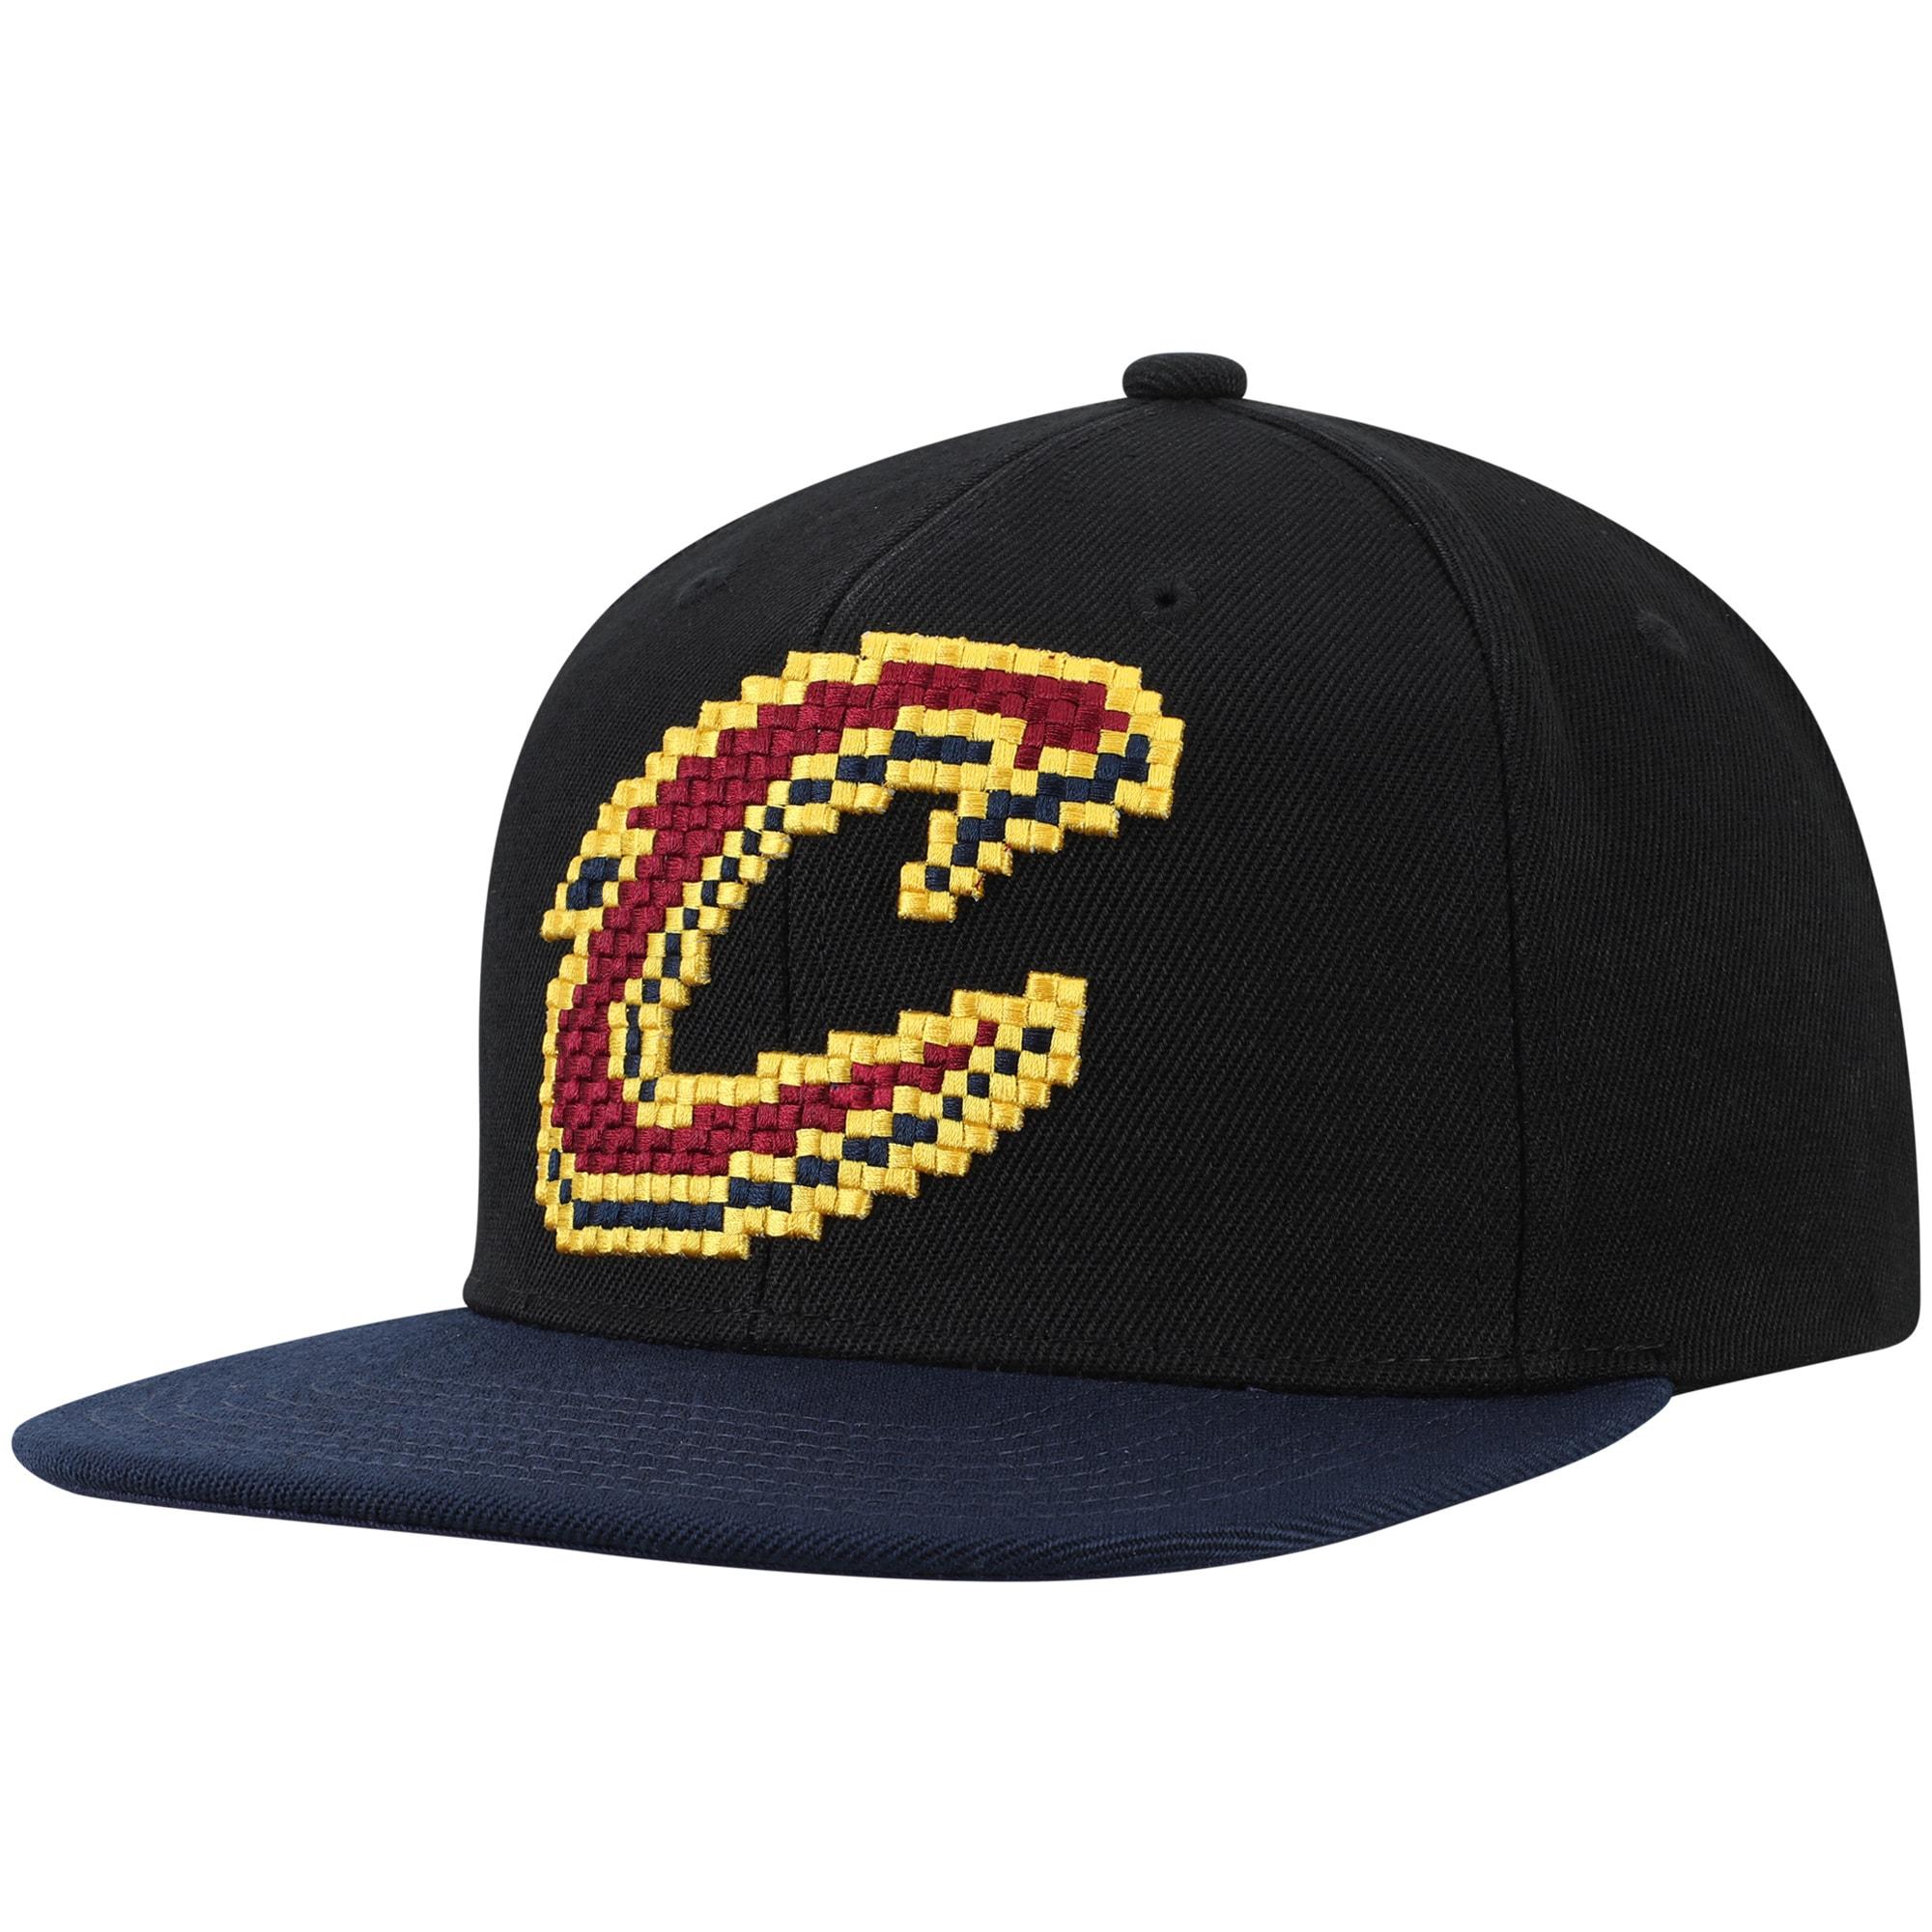 Cleveland Cavaliers Mitchell & Ness 8-Bit Two-Tone Adjustable Snapback Hat - Black